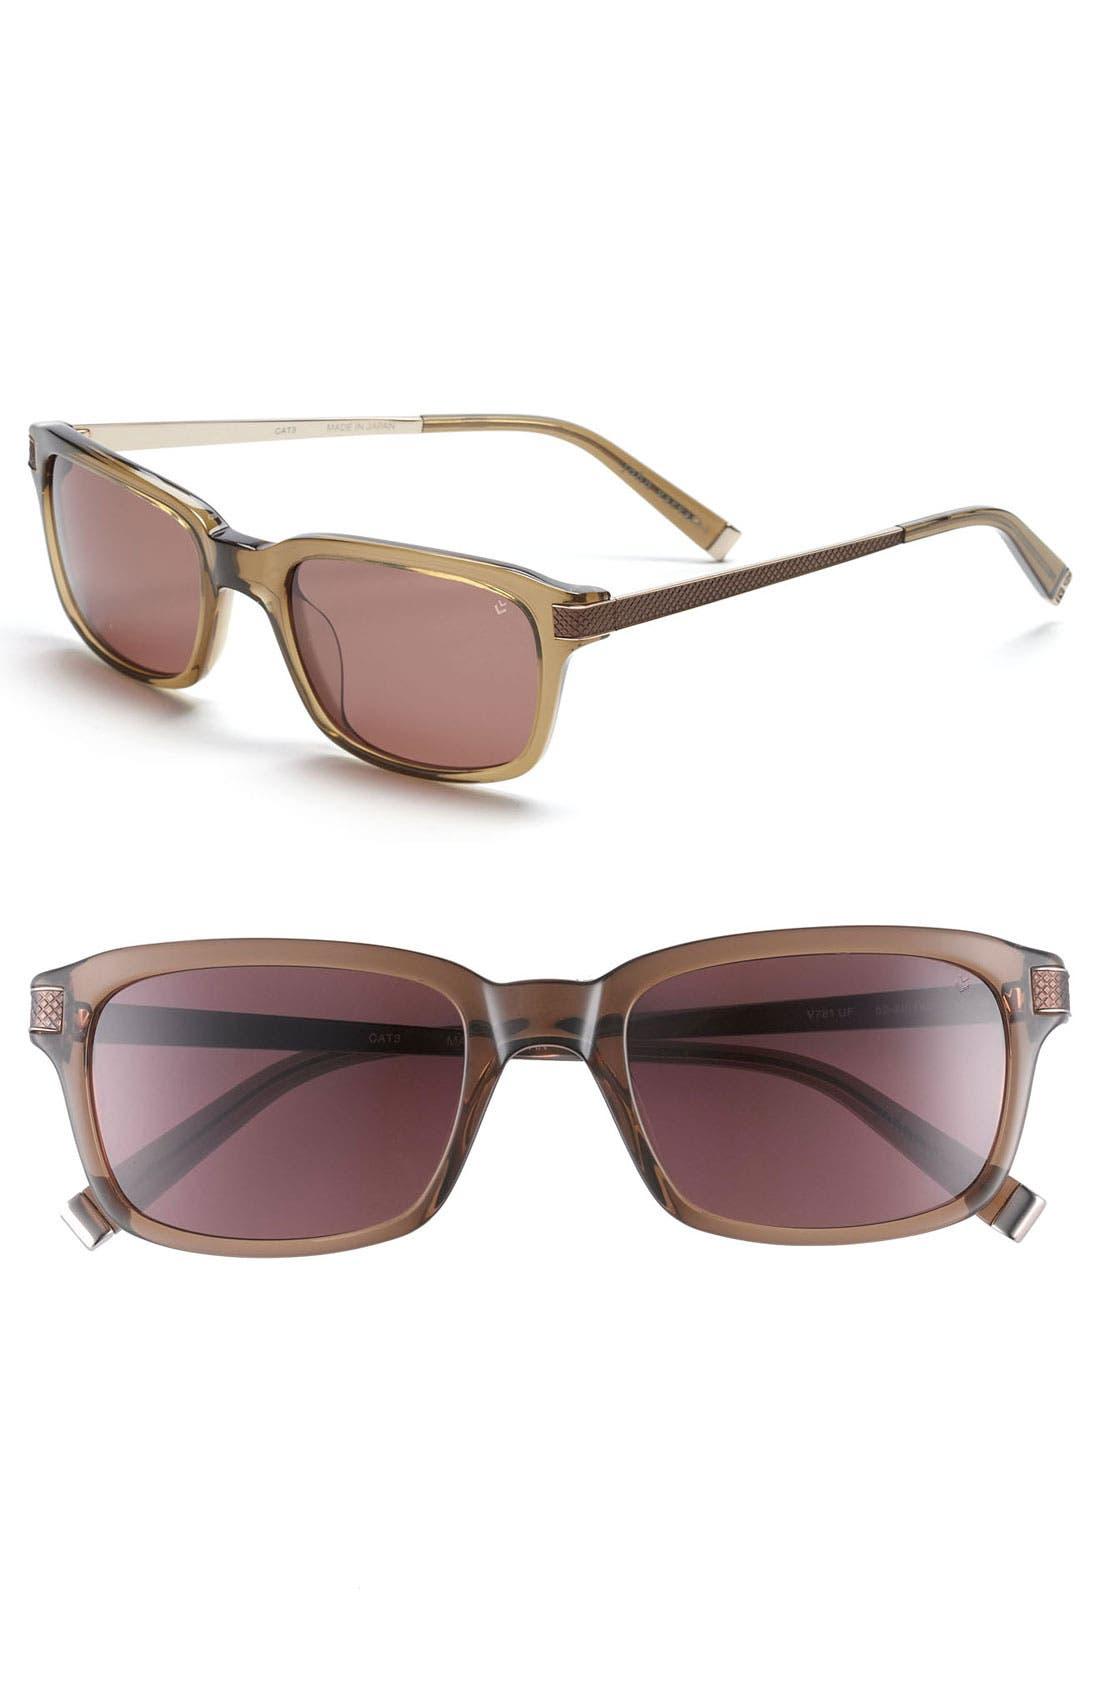 Main Image - John Varvatos Collection 'Modern' 52mm Aviator Sunglasses